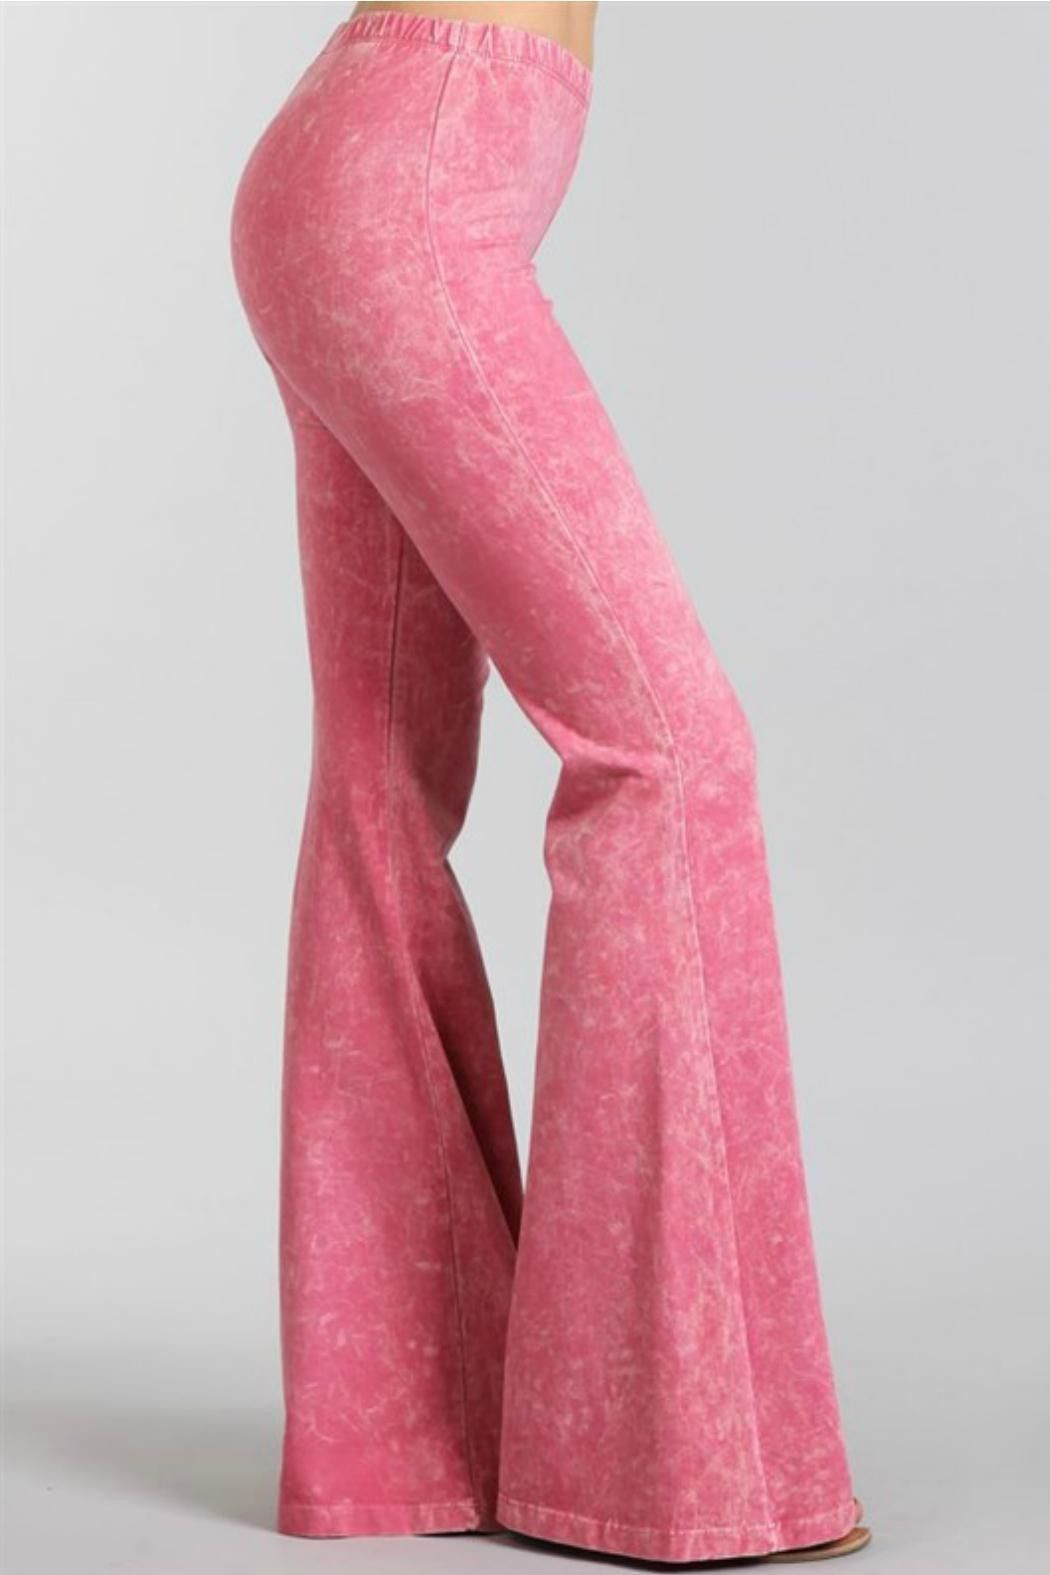 Bell Bottoms Yoga Pants Denim Colored Pink